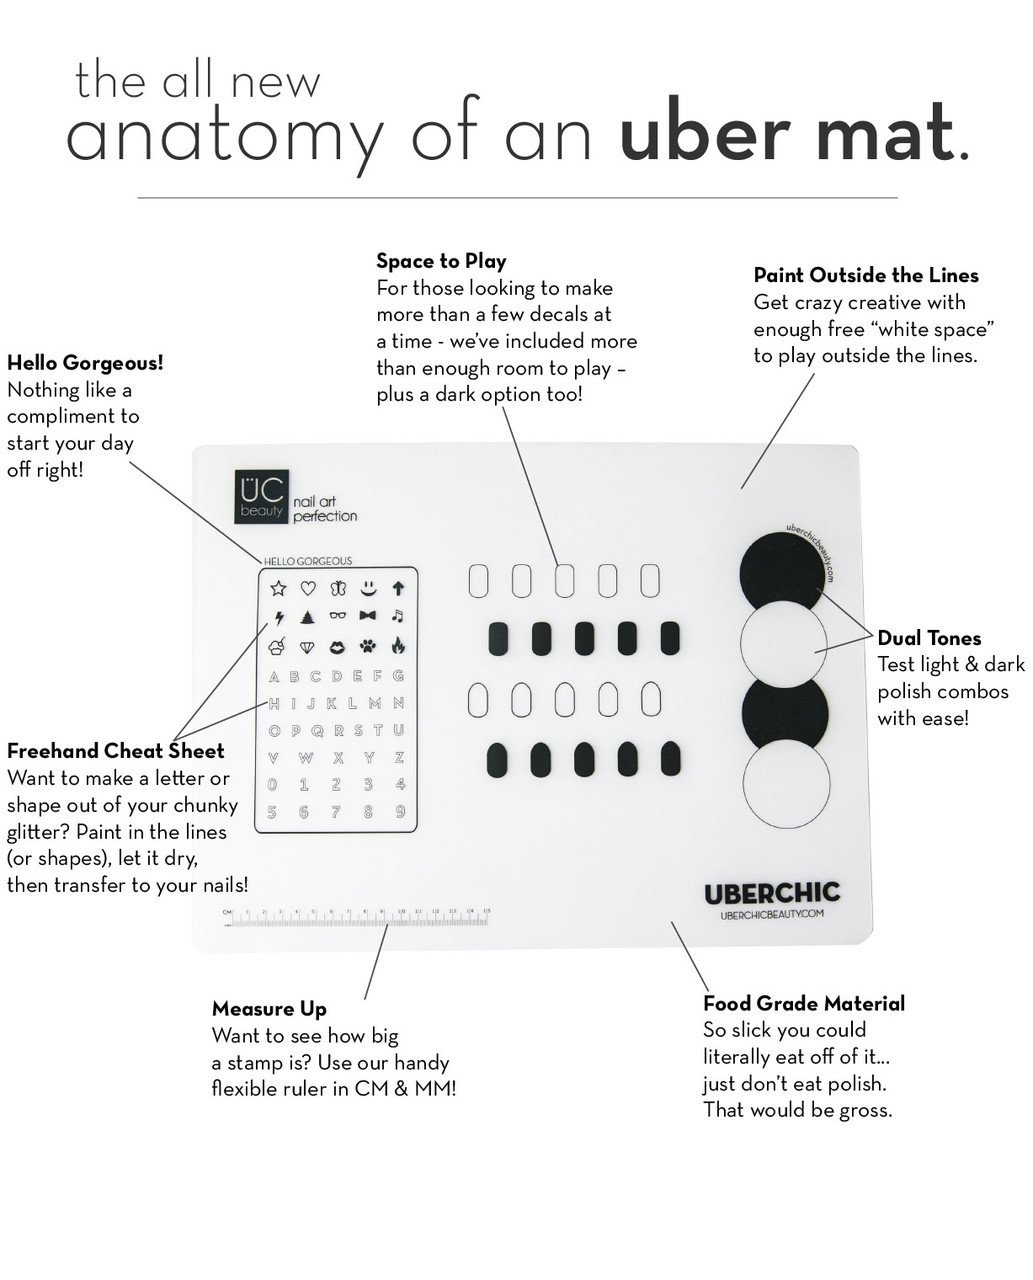 Amazon.com: Uber Mat: Nail Art Mat by UberChic Beauty: Beauty